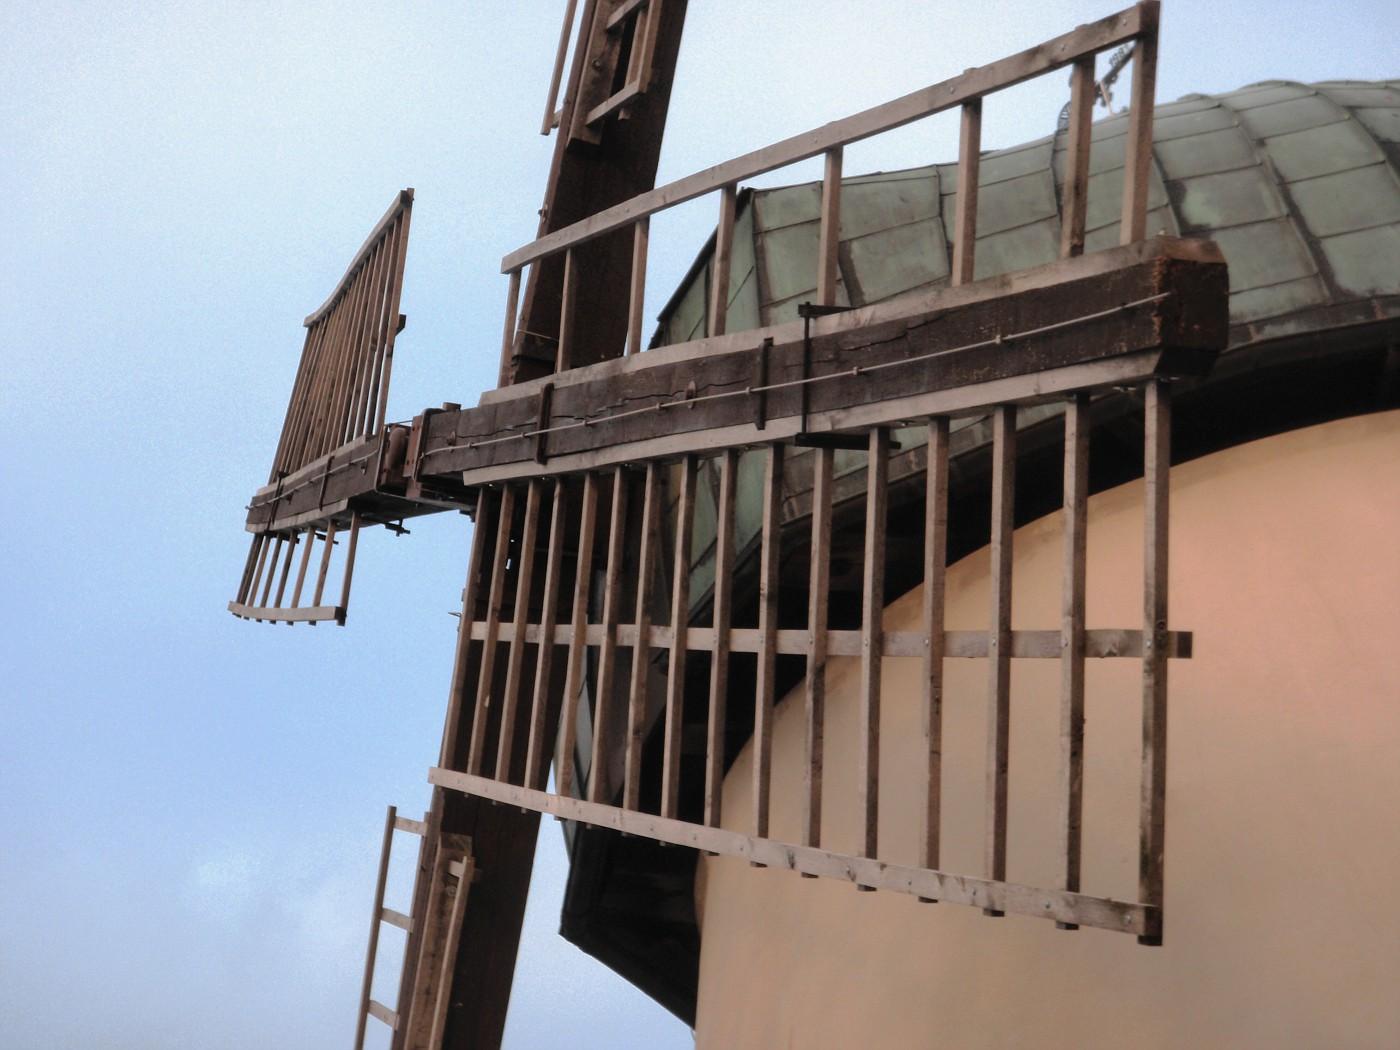 Flügel der Windmühle Tündern